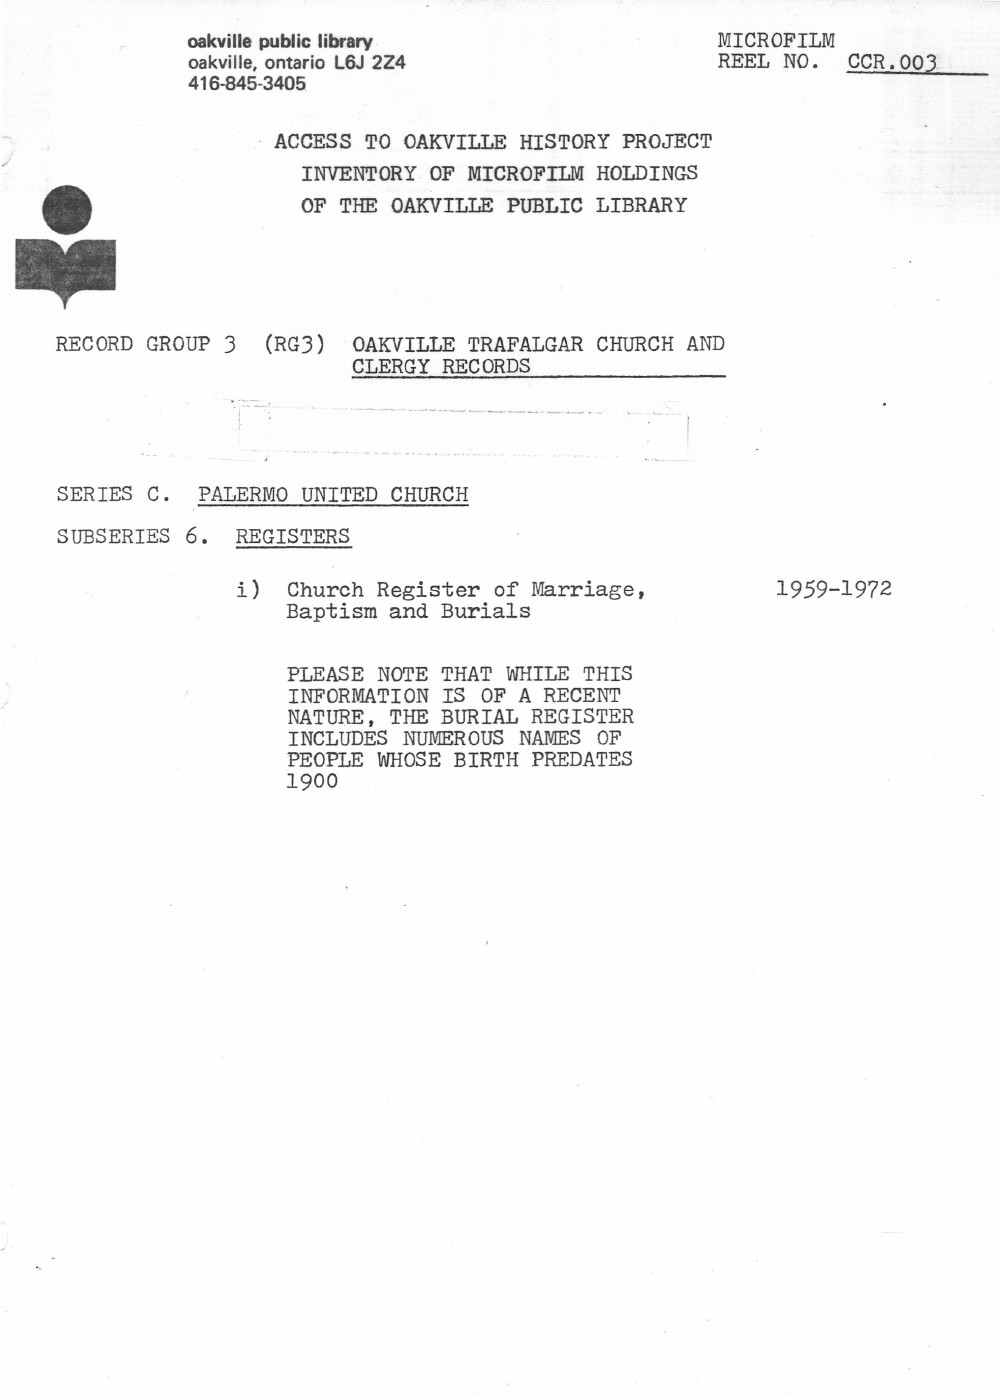 Microfilm Collection Index - Palermo United Church, Walton Memorial United Church